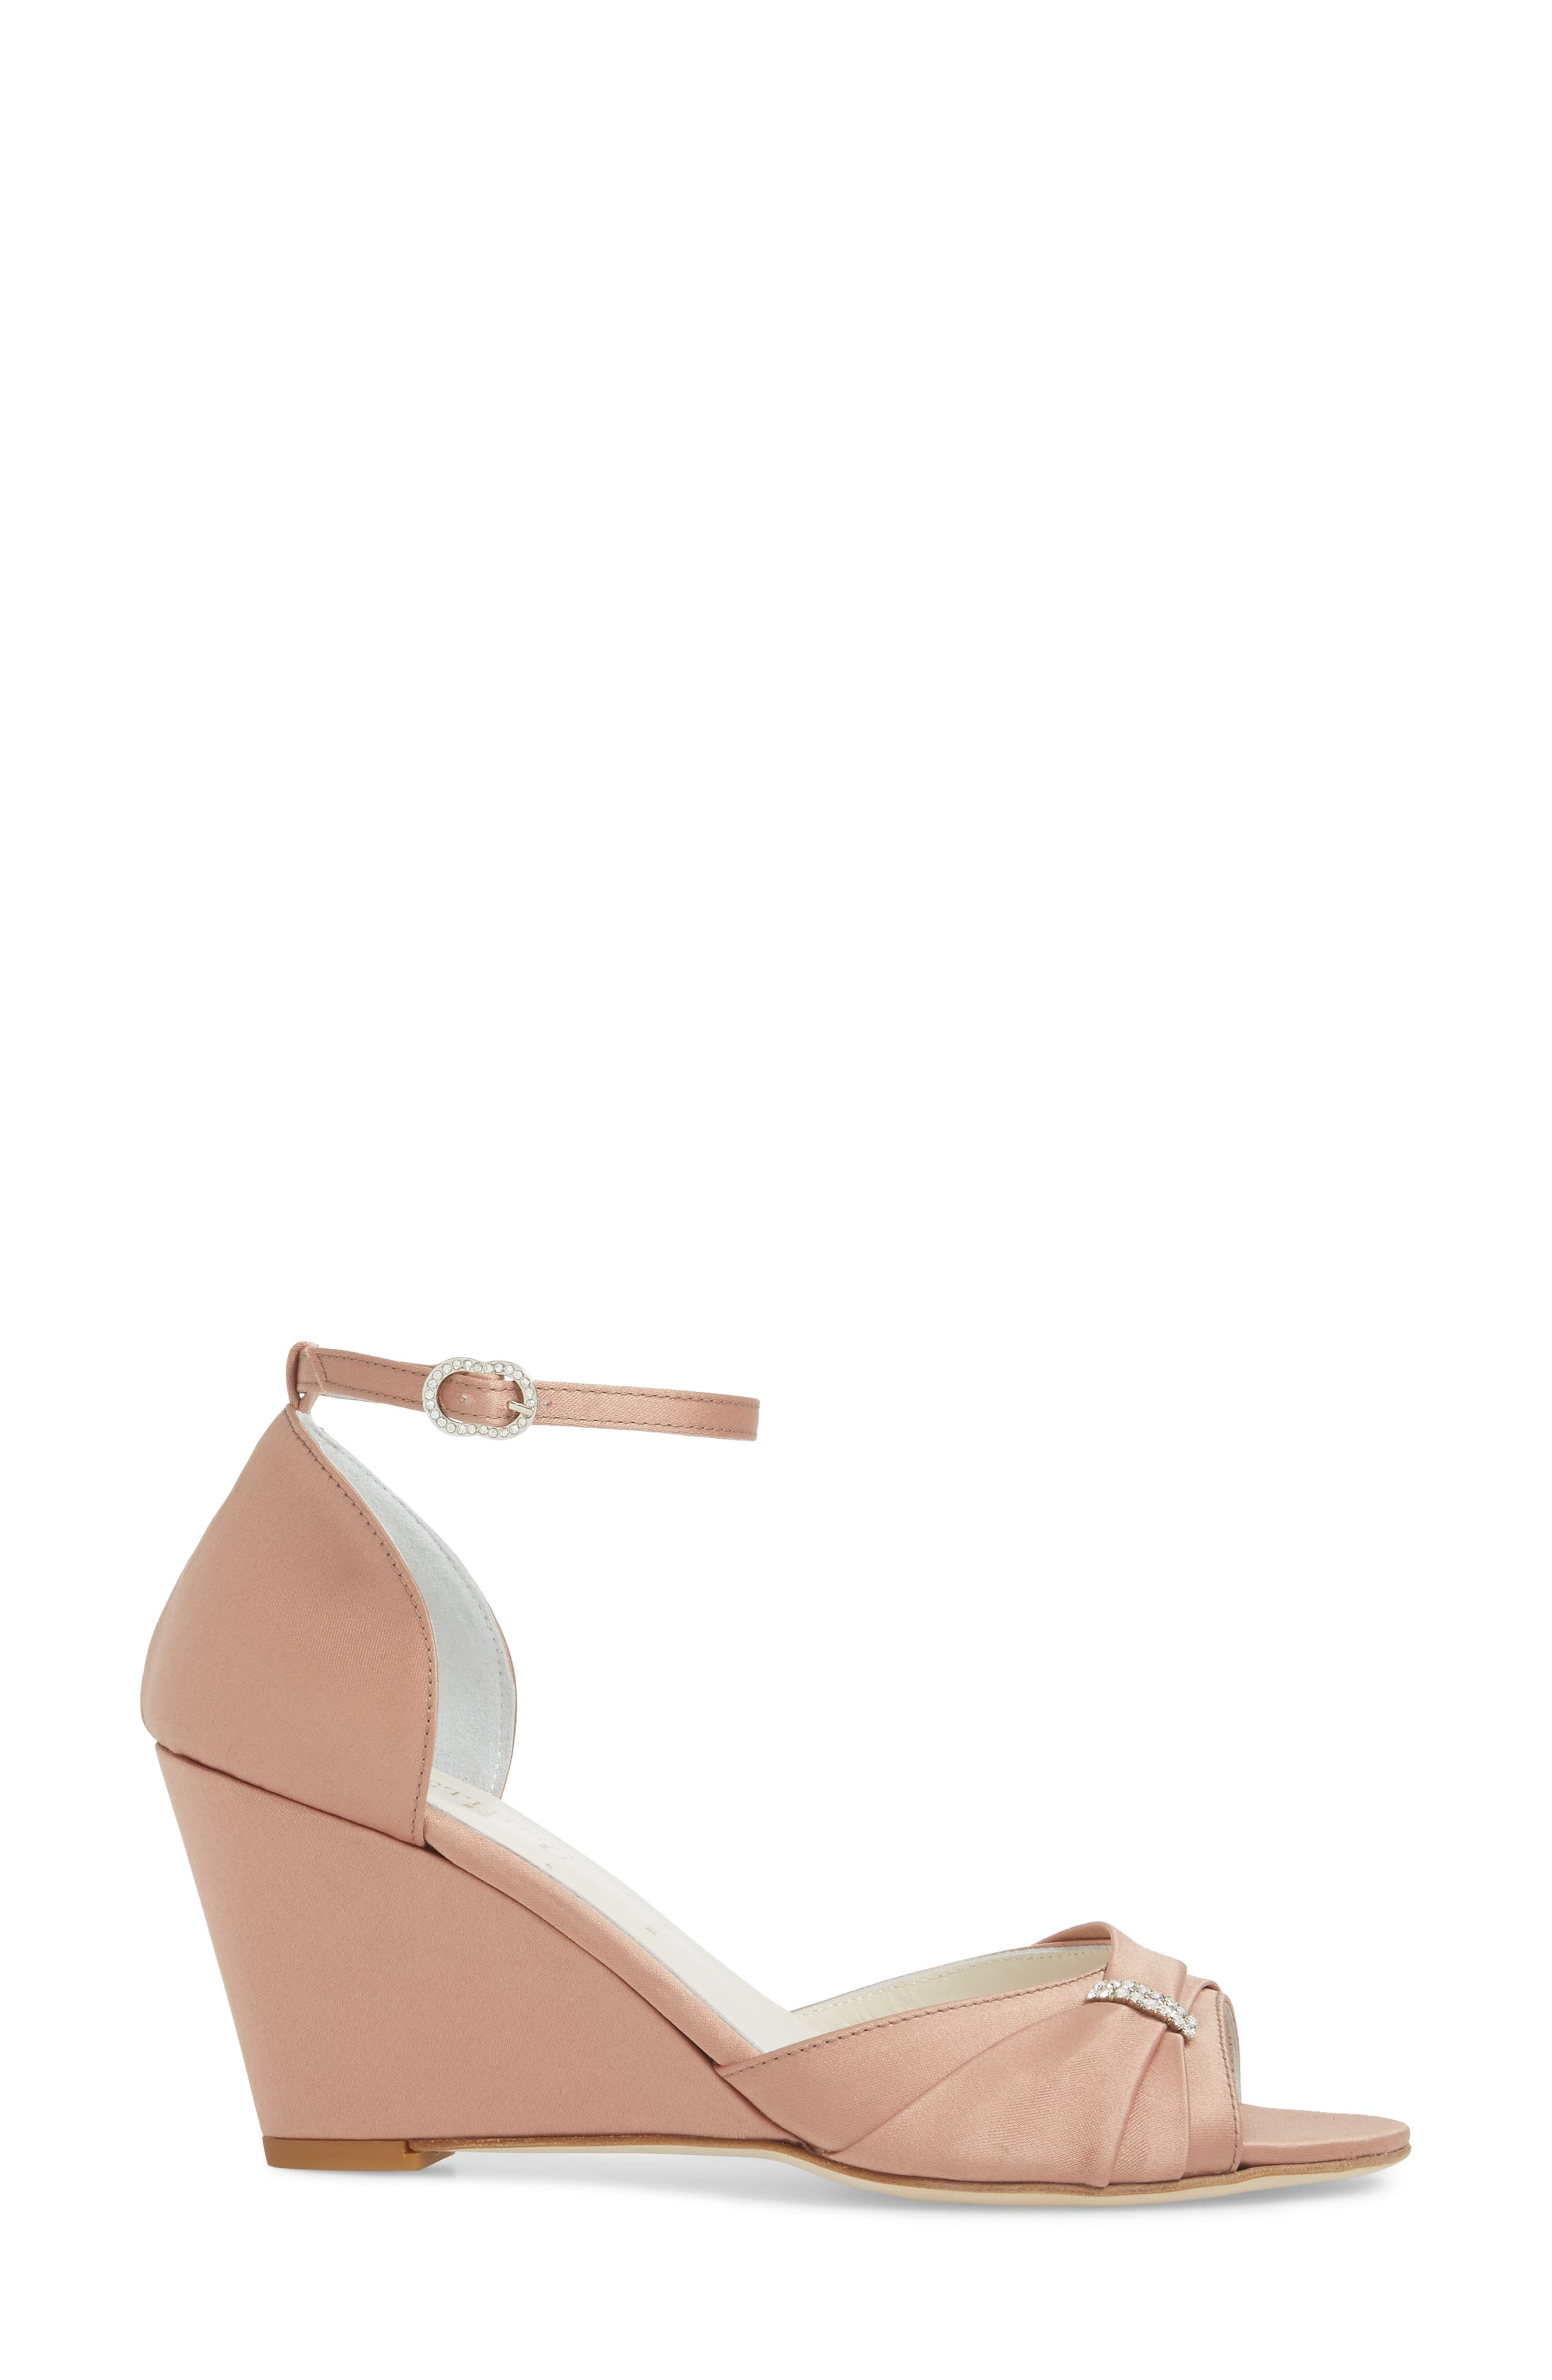 Queenie Ankle Strap Wedge Sandal,                             Alternate thumbnail 3, color,                             Blush Satin